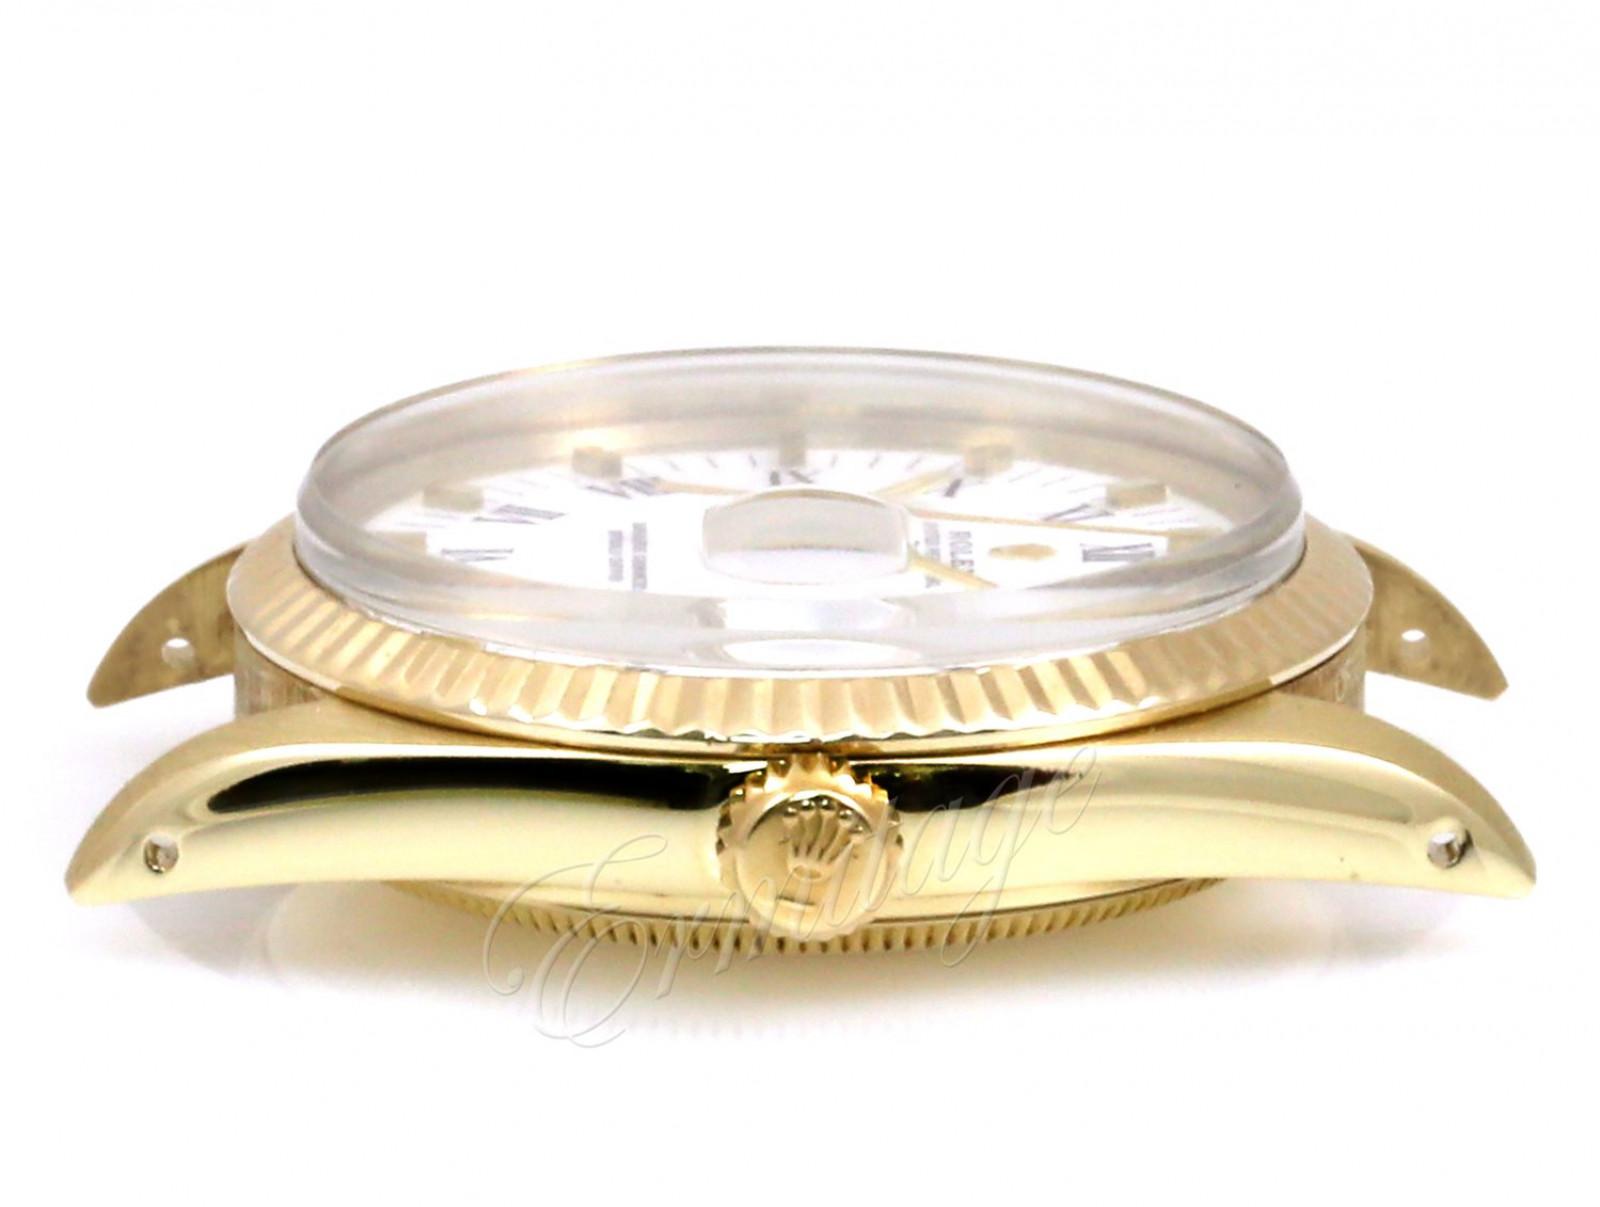 Rolex Oyster Perpetual Date 15037